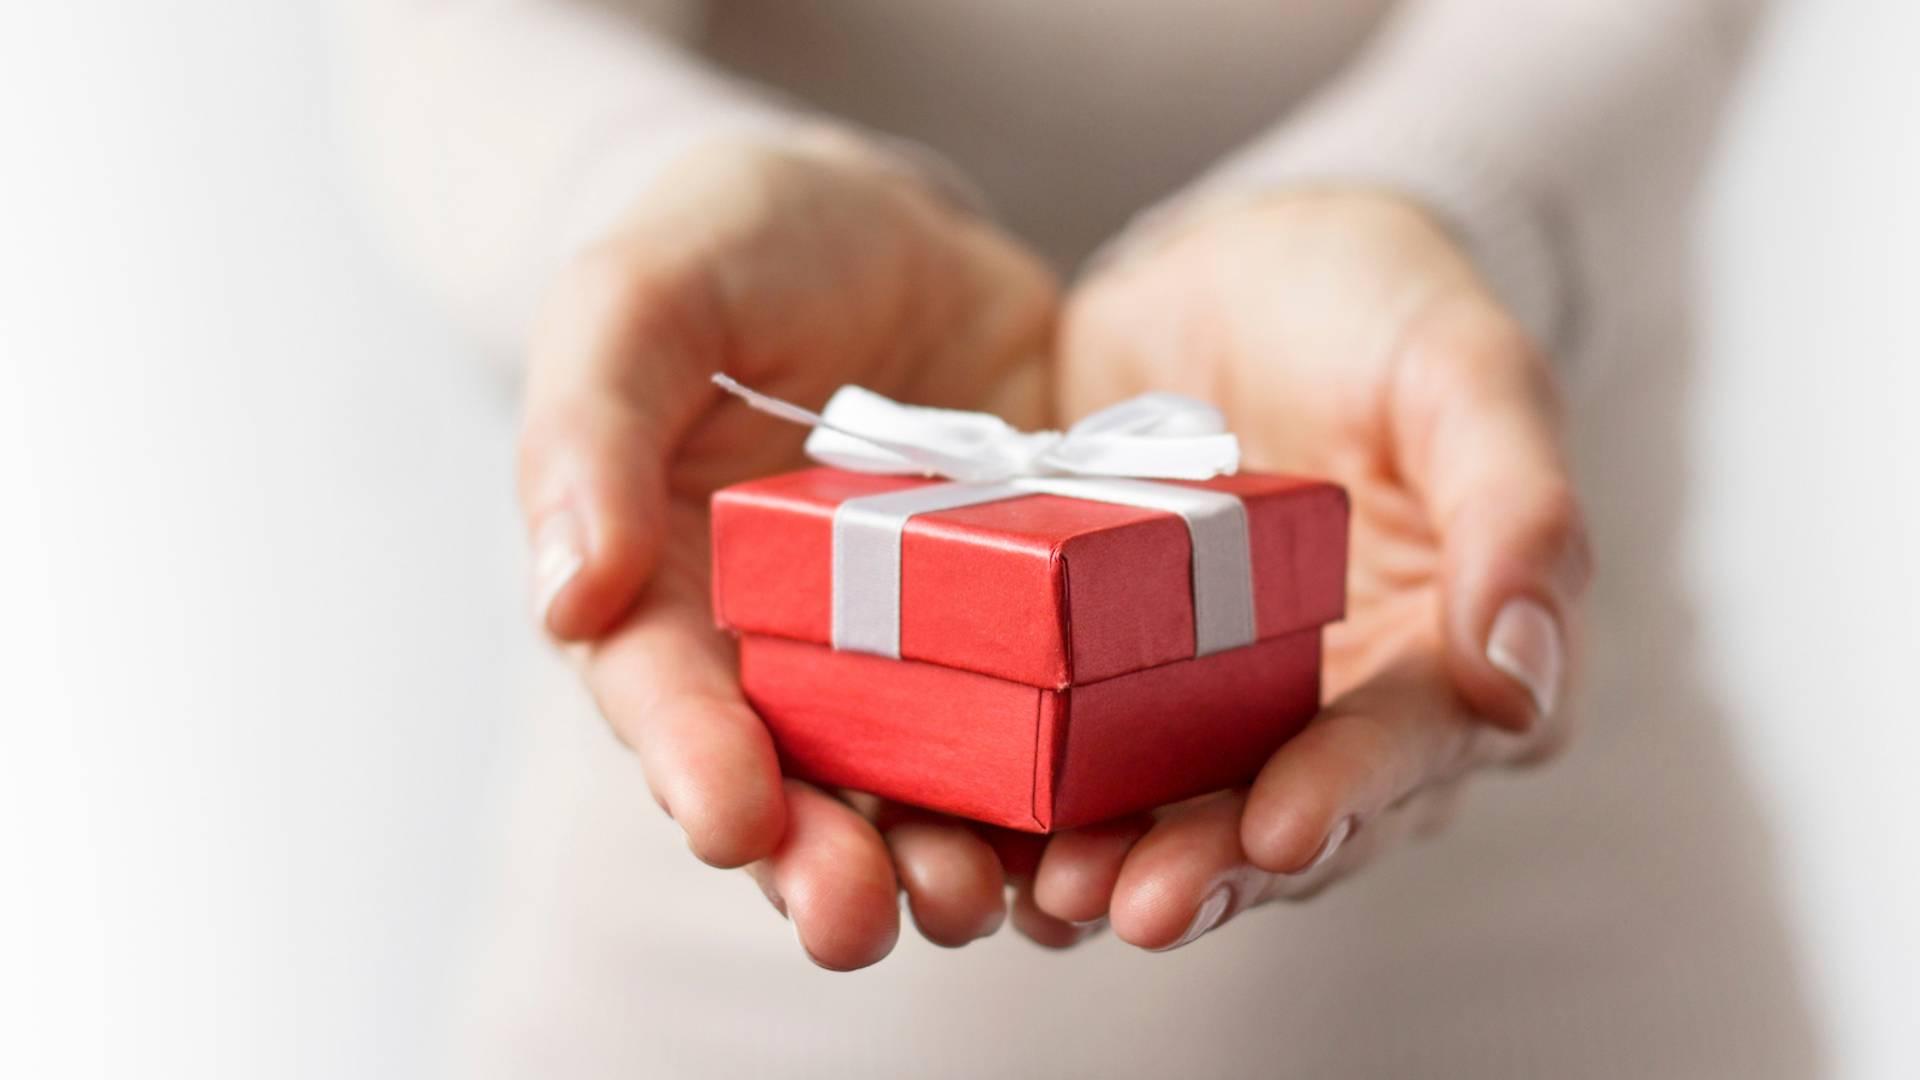 Прими подарок